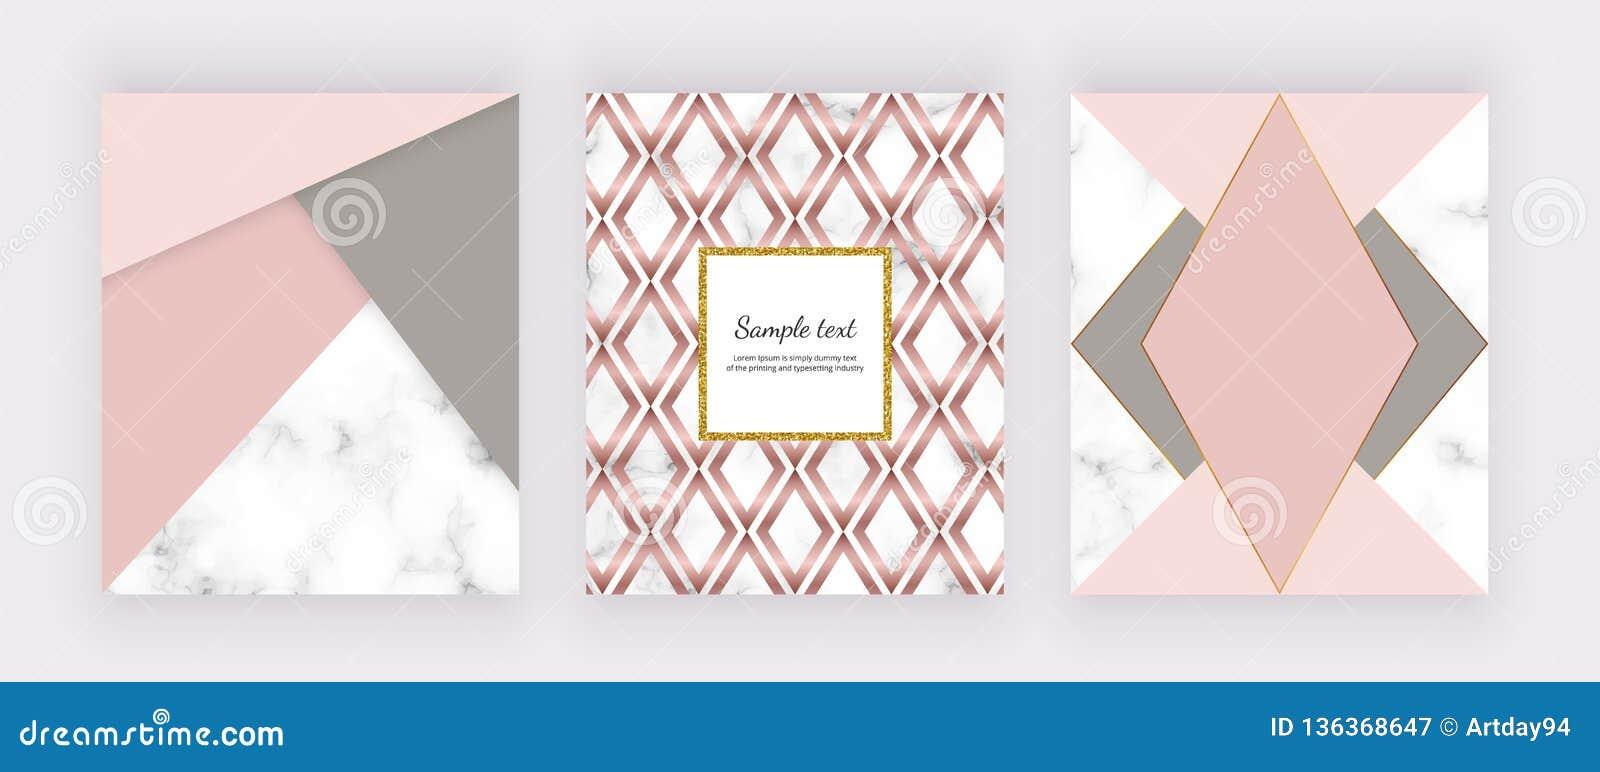 Marble Geometric Design With Pink And Grey Triangular Geometric